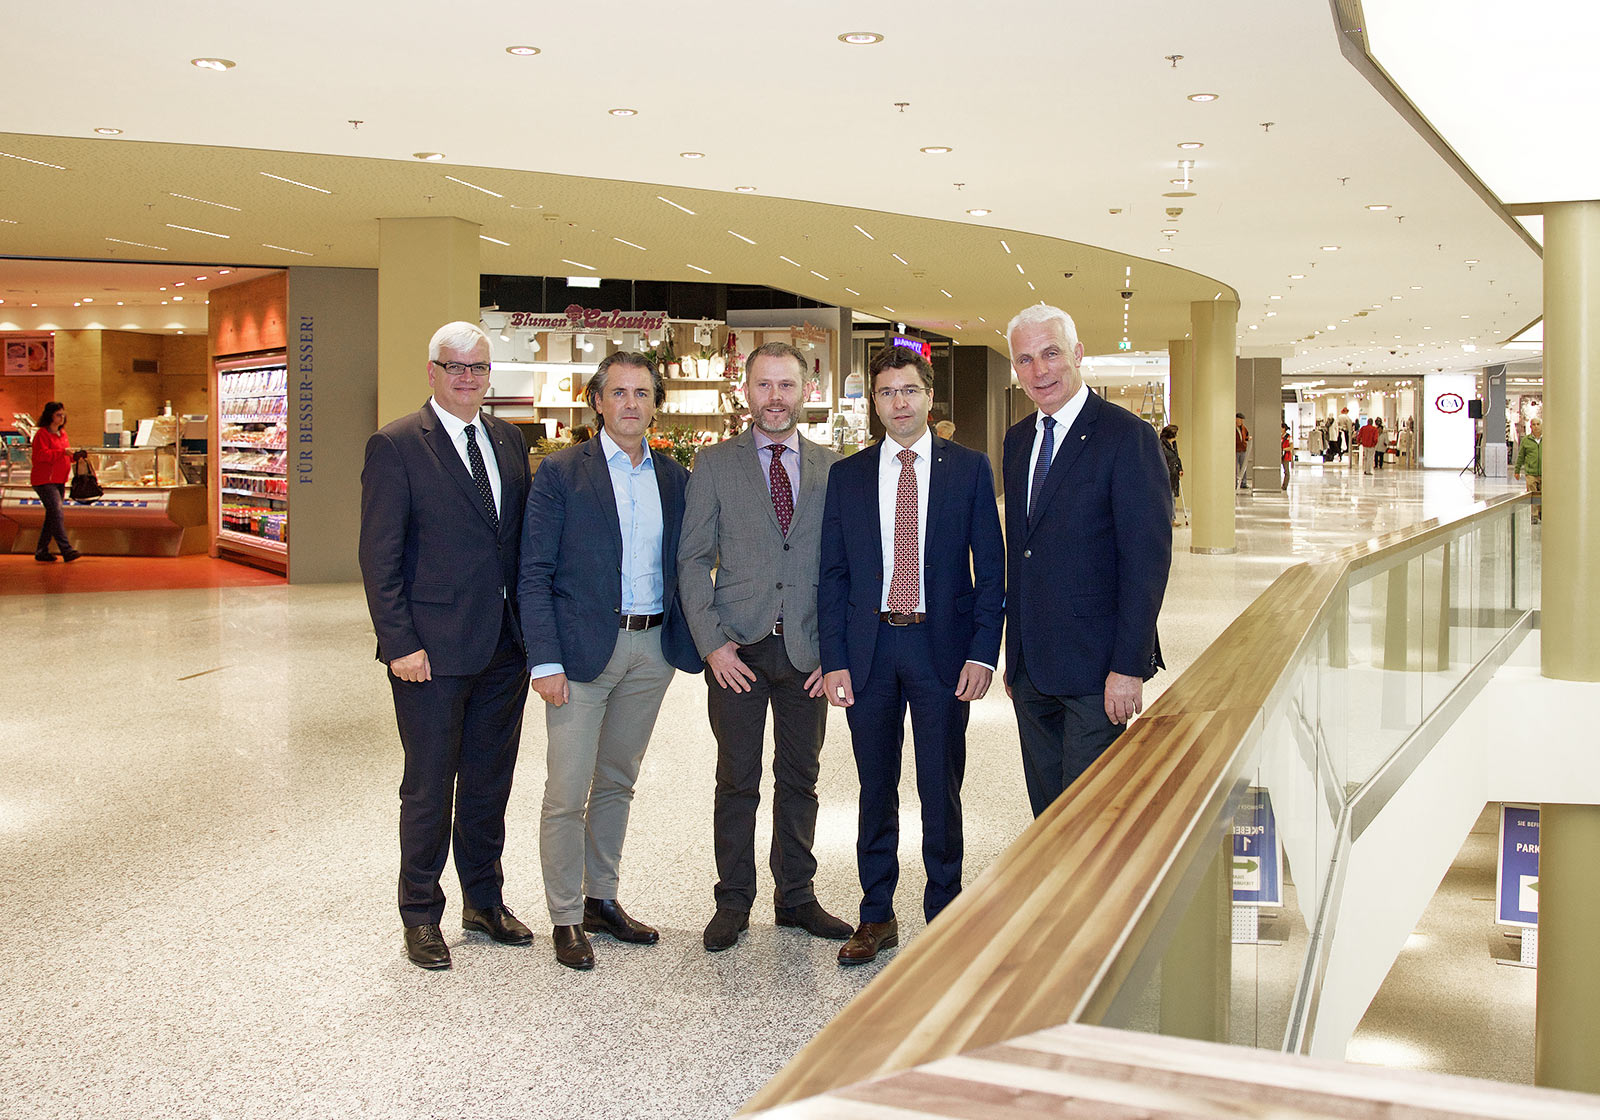 From left: Marcus Wild/CEO SES, Robert Kelca/ATP partner in Innsbruck, Linus Hiort/Dressmann – Varner Group, Markus Kaser/CEO Interspar, Helmut Hochfilzer/SILLPARK Center Manager. Photo: ATP